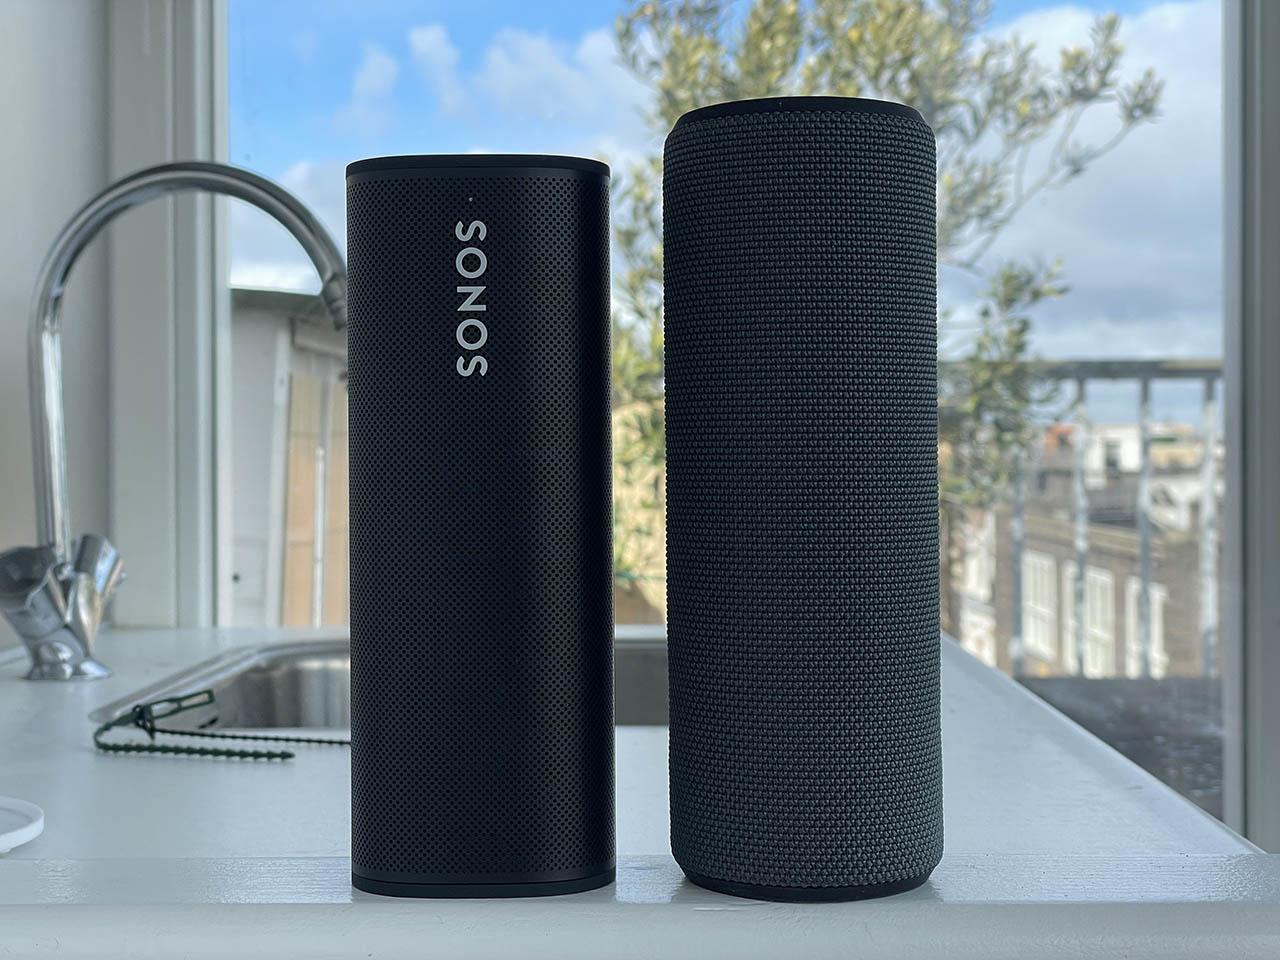 Sonos Roam vs UE Boom